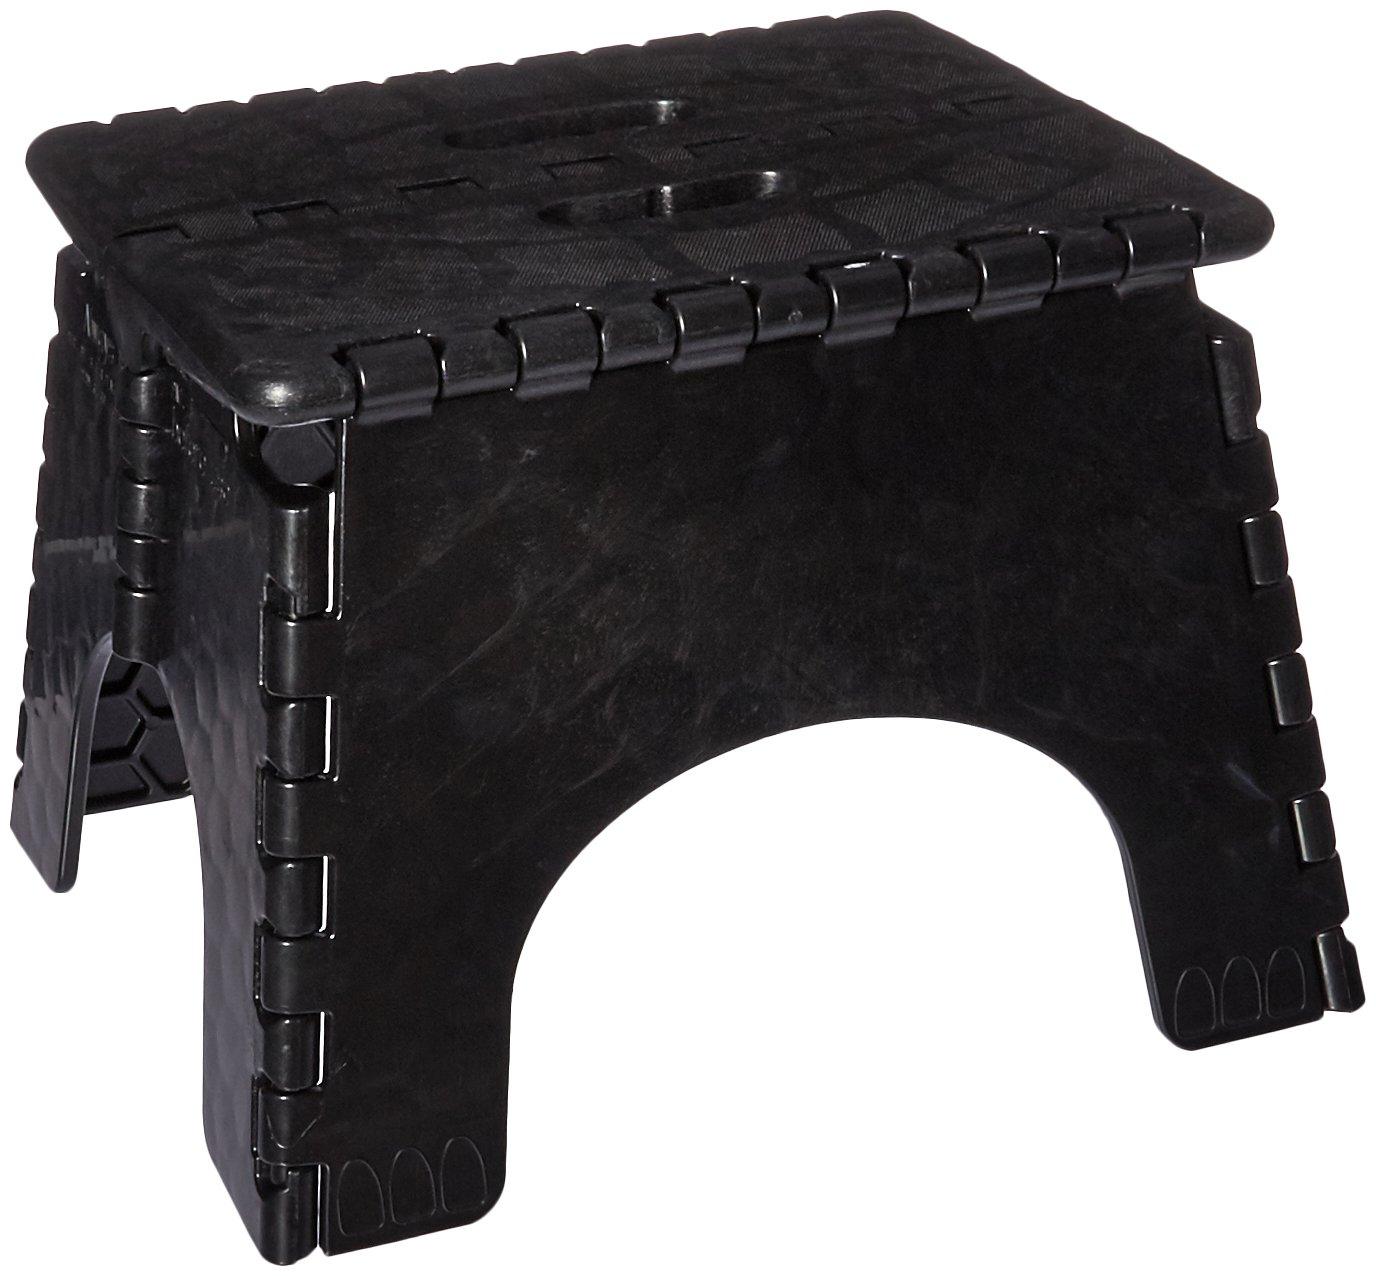 B Amp R Plastics 1016bk Black Ez Foldz Hardware Shop Stools